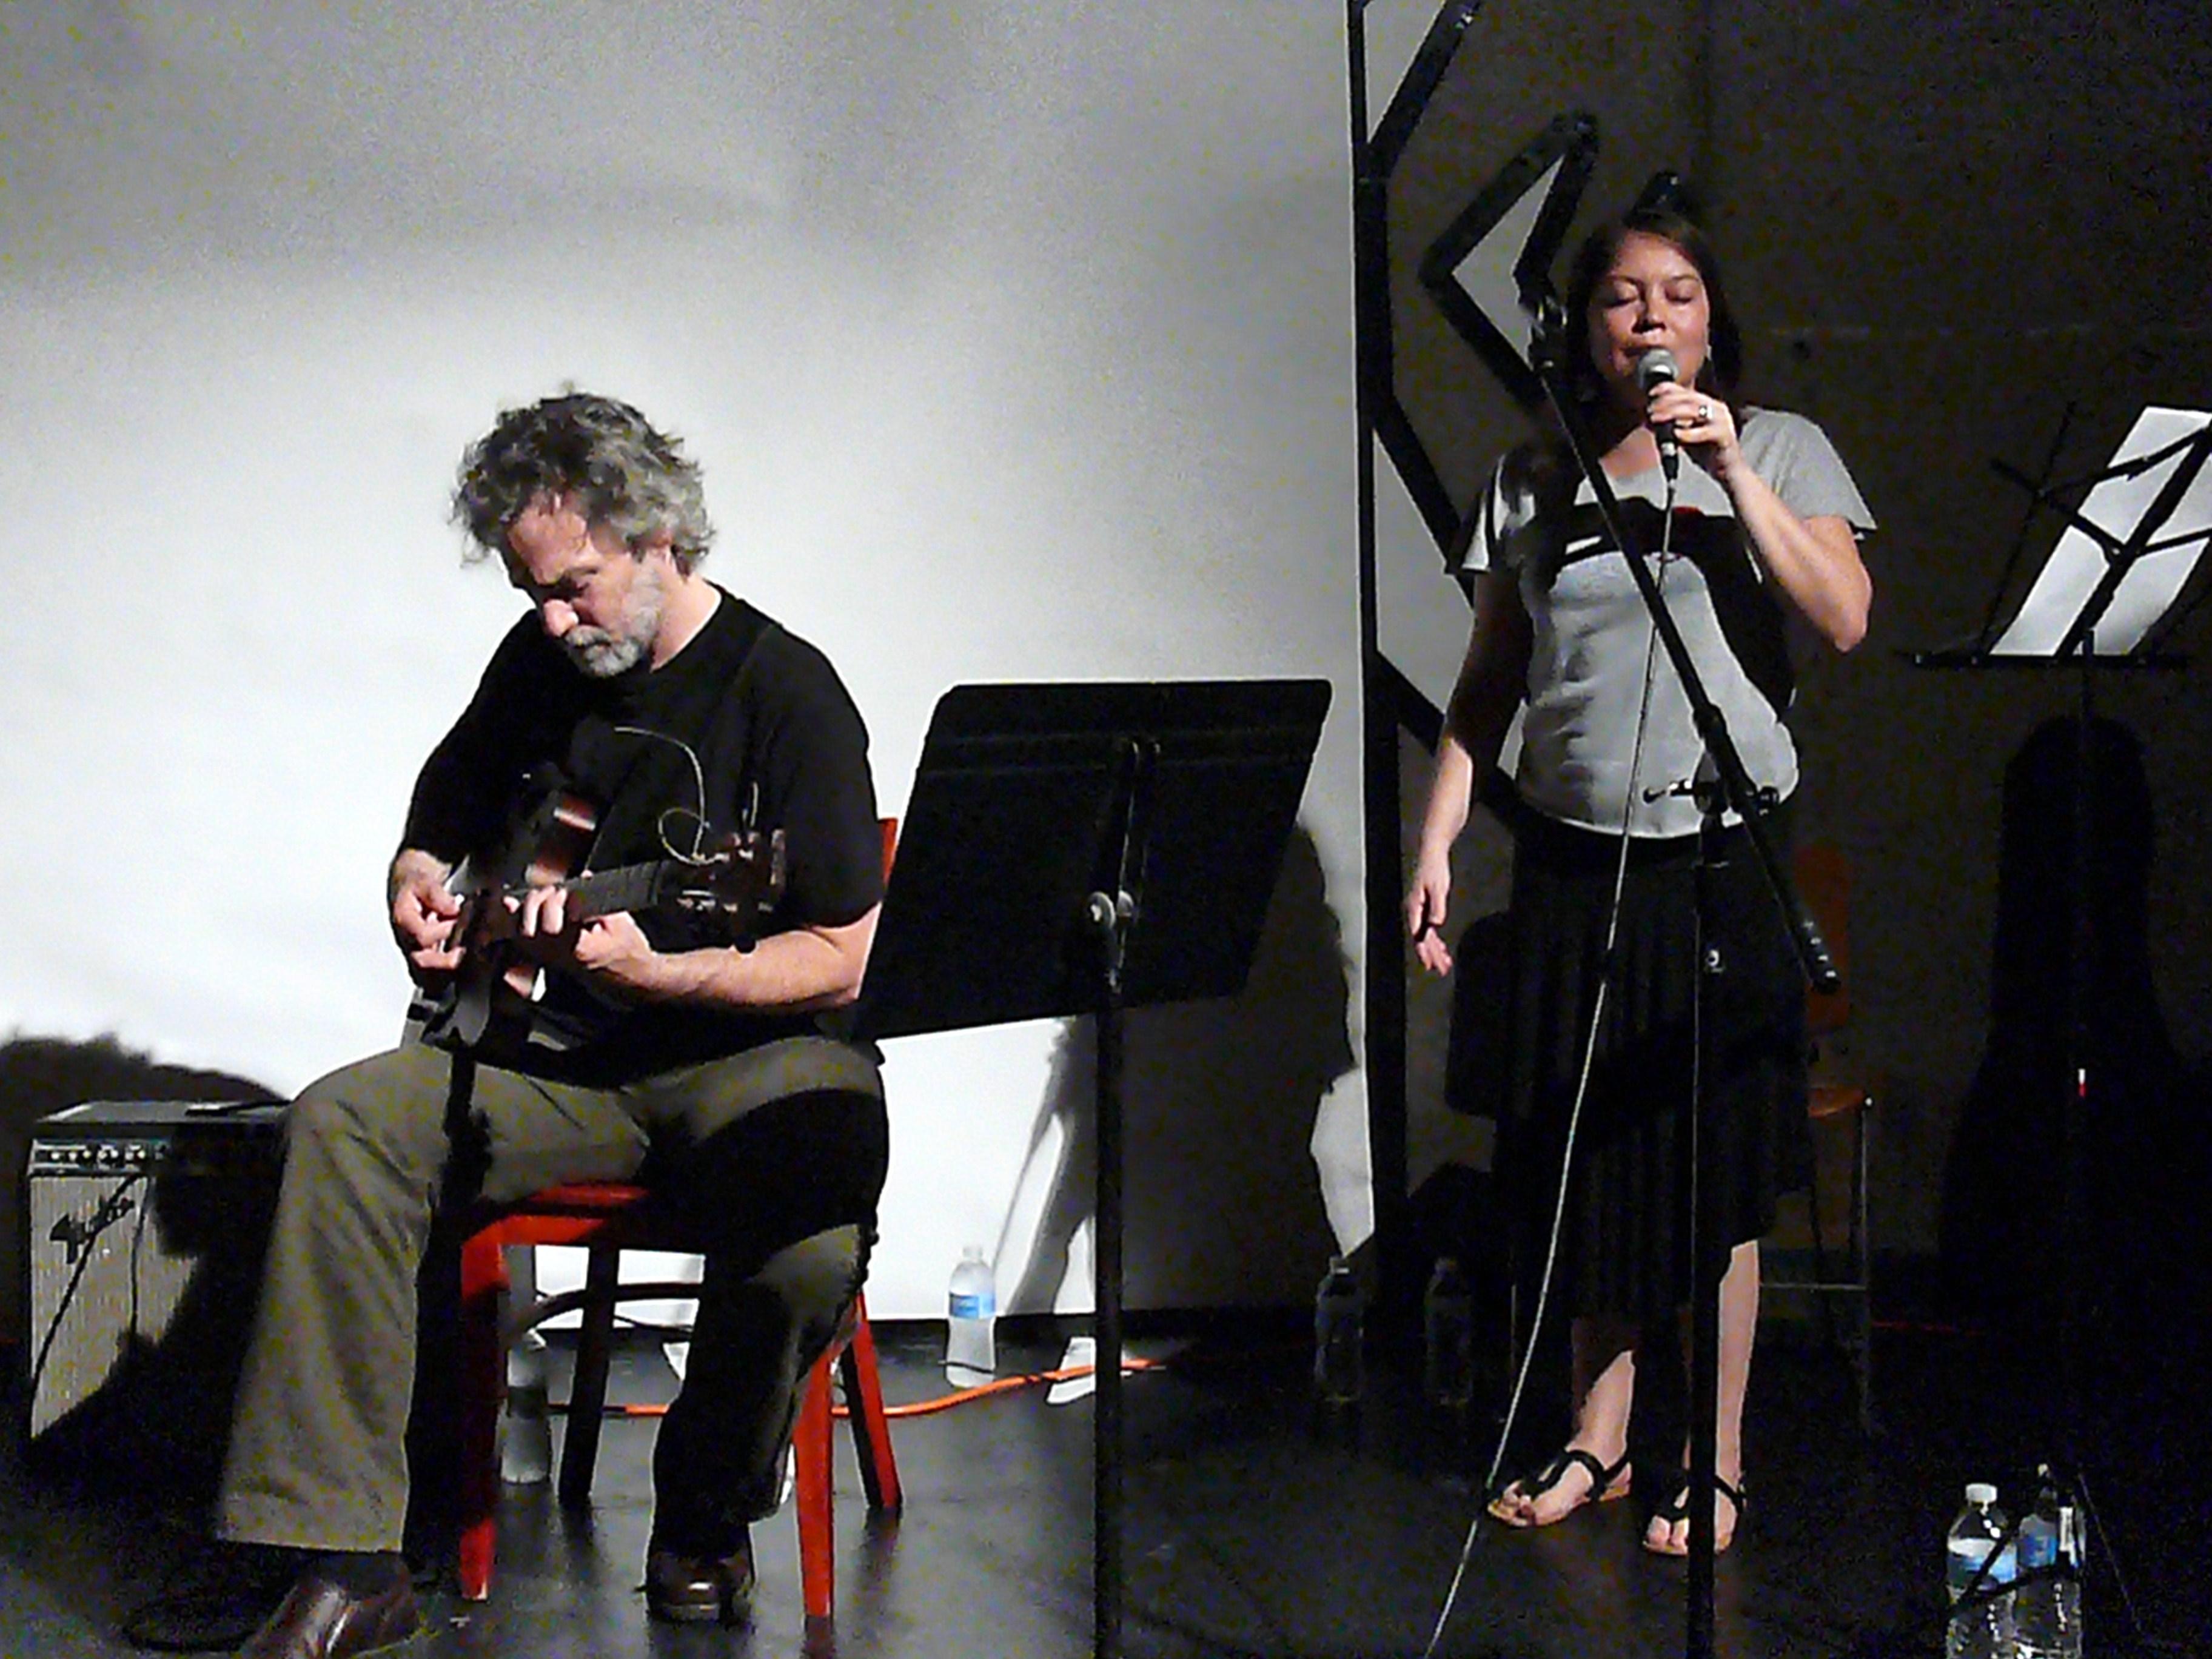 Joe Morris and Jean Carla Rodea at the 2010 Vision Festival in New York